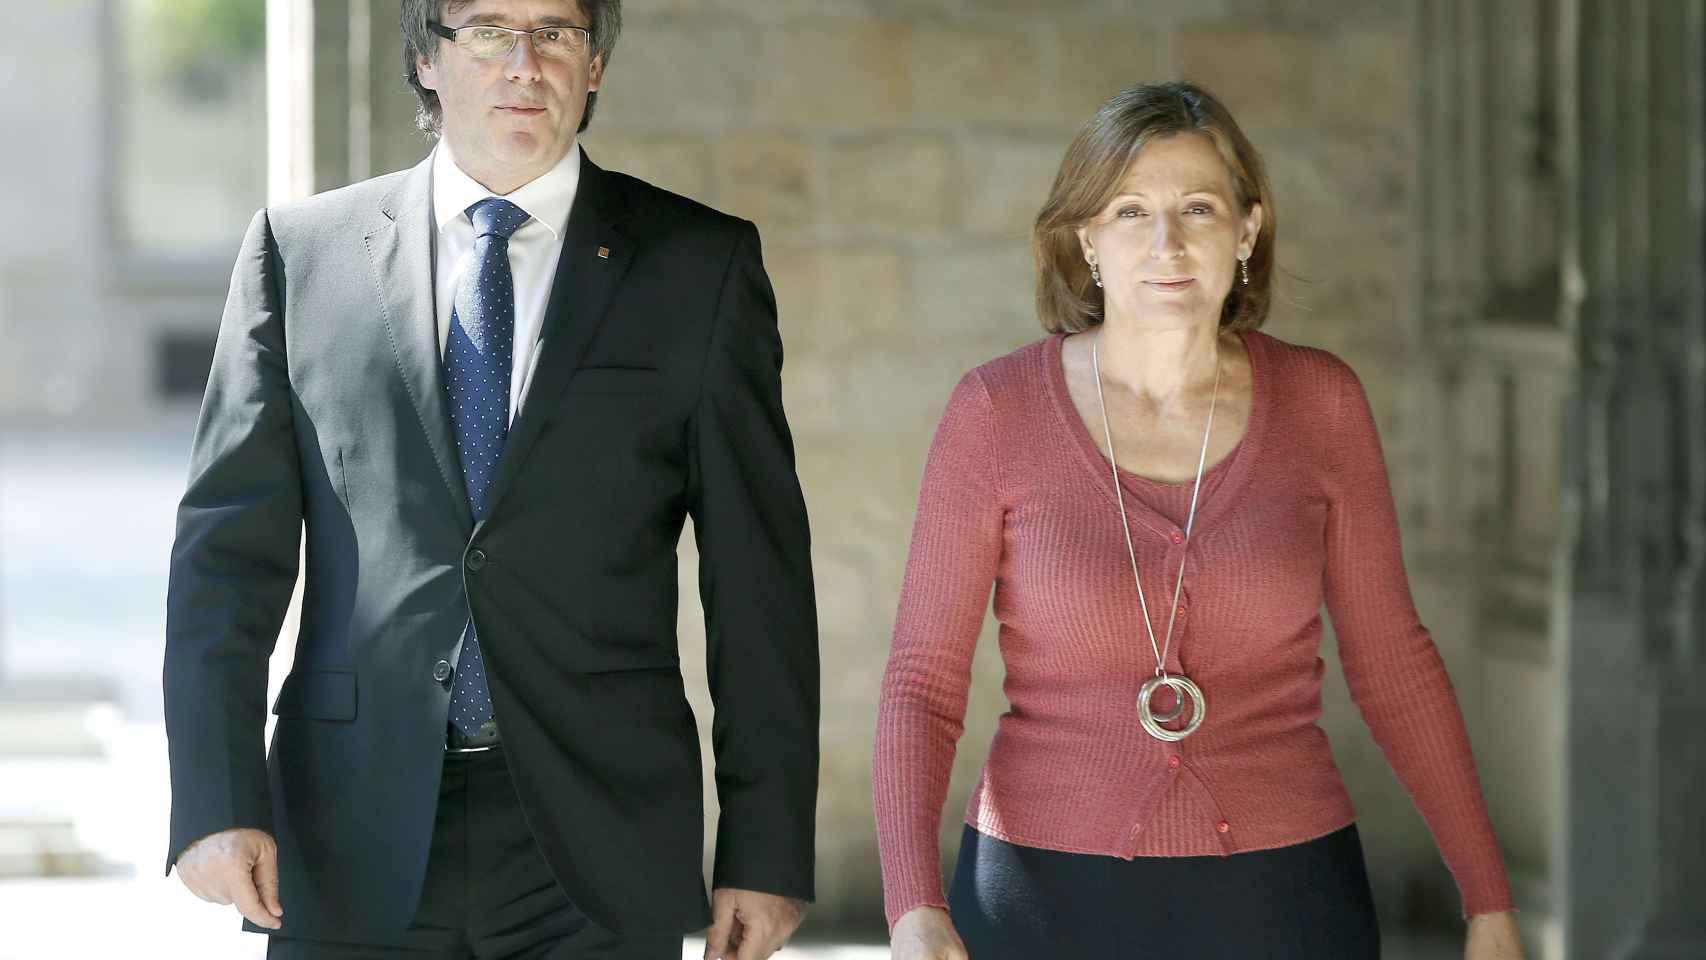 La presidenta del Parlament, Carme Forcadell, junto al presidente de la Generalitat, Carles Puigdemont